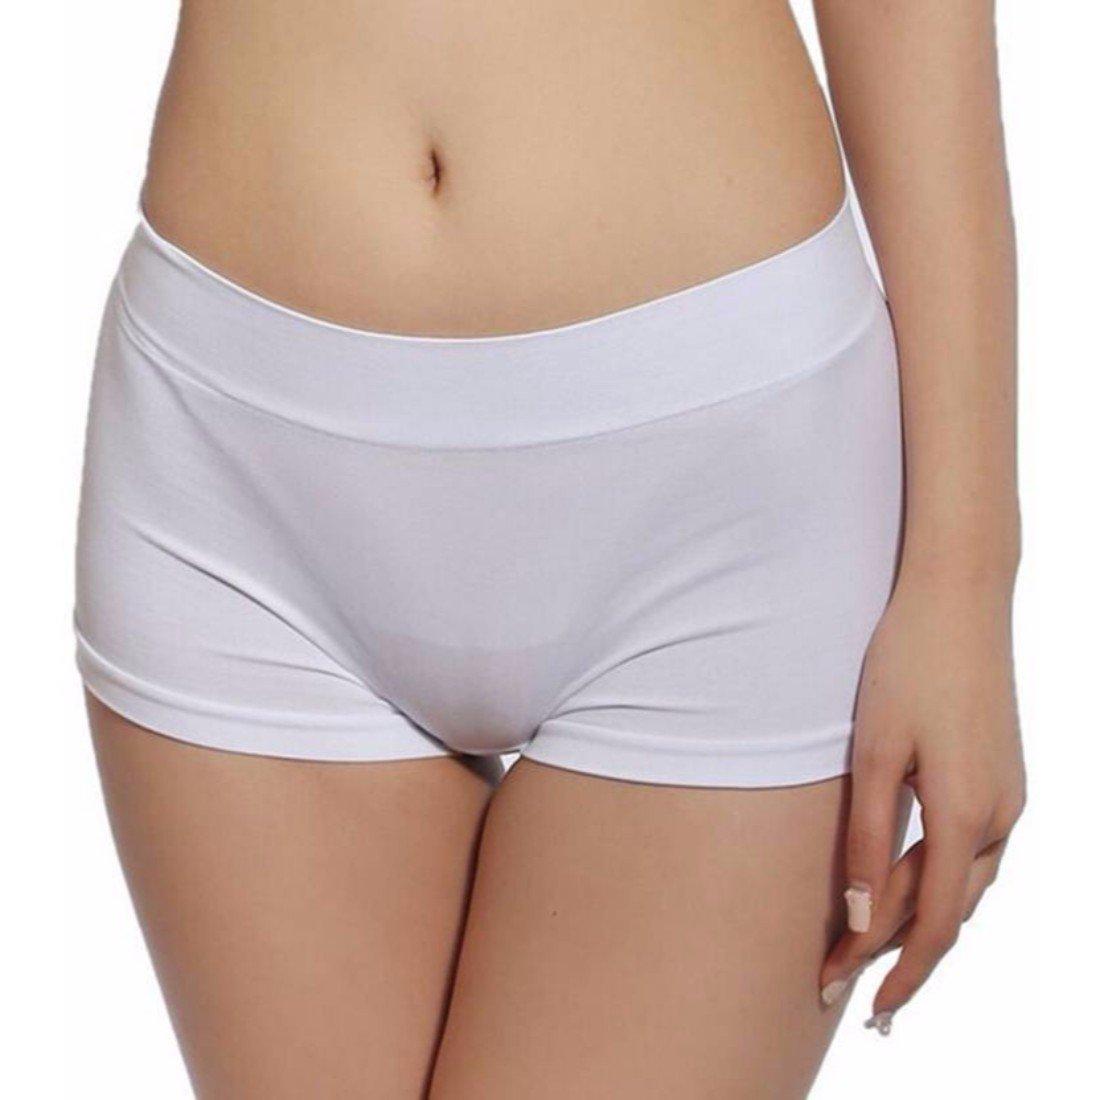 6adc602938 Ritu Creation Women s Girl s Beachwear Non Padded Tube Bra and Boyshort  Panty Set ...